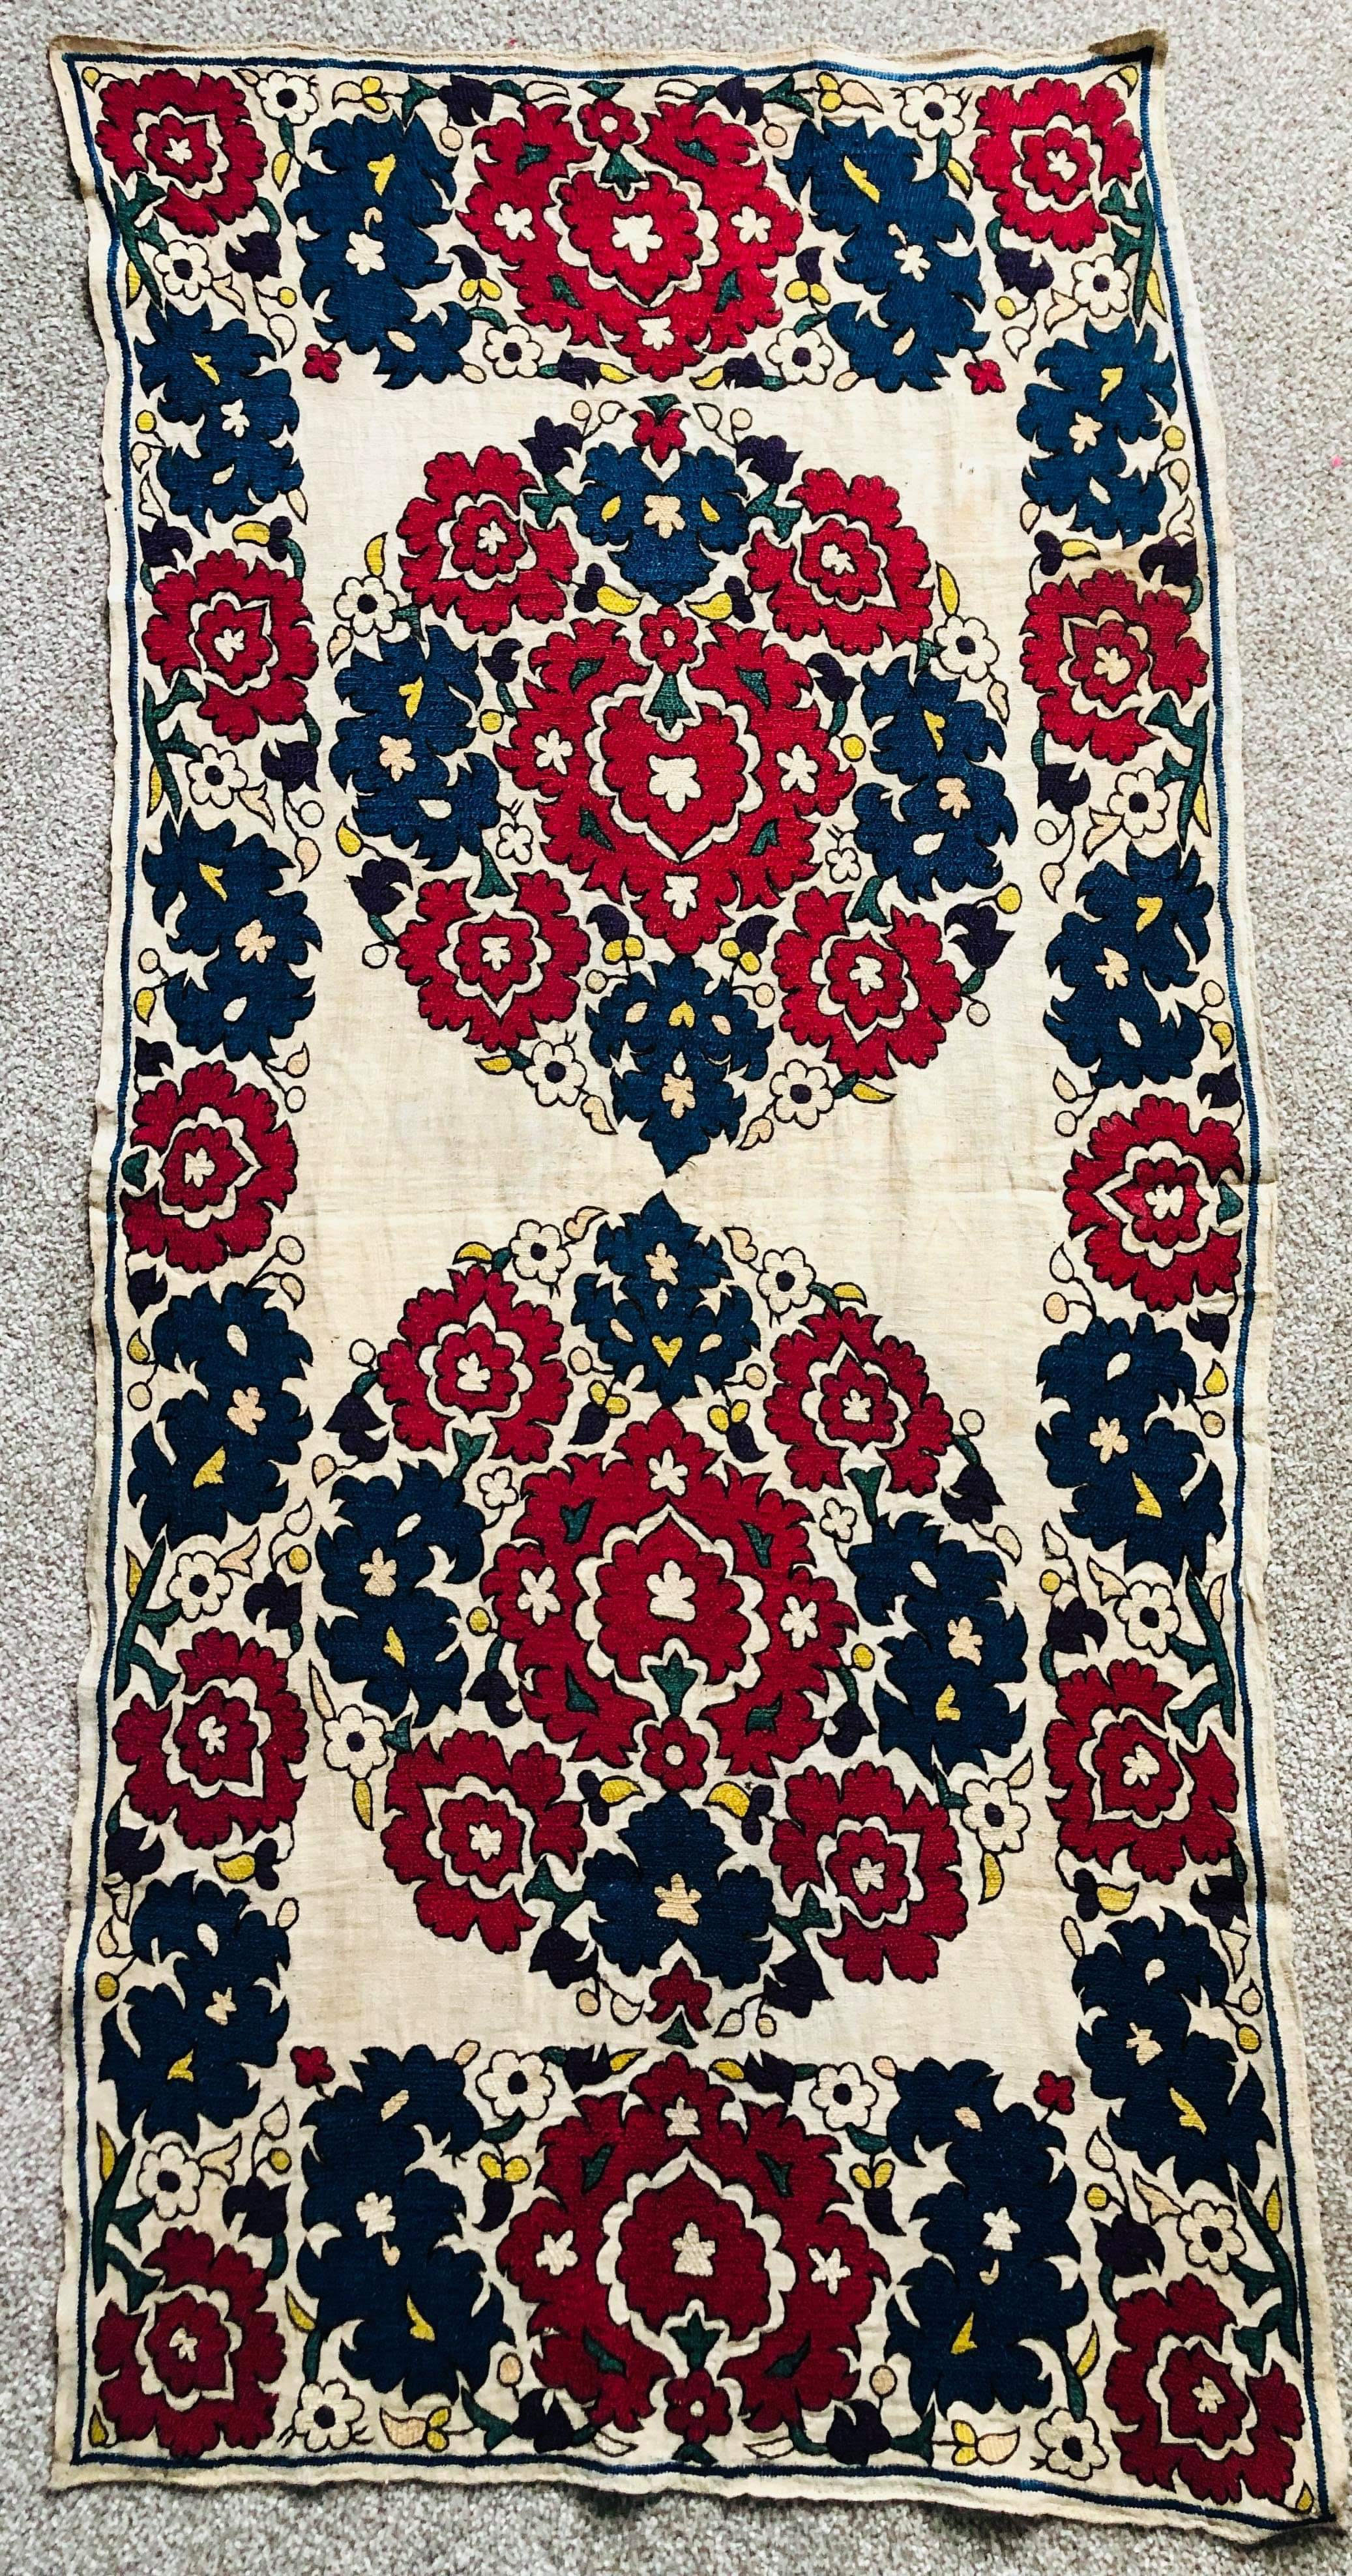 Antique Algerian embroidery